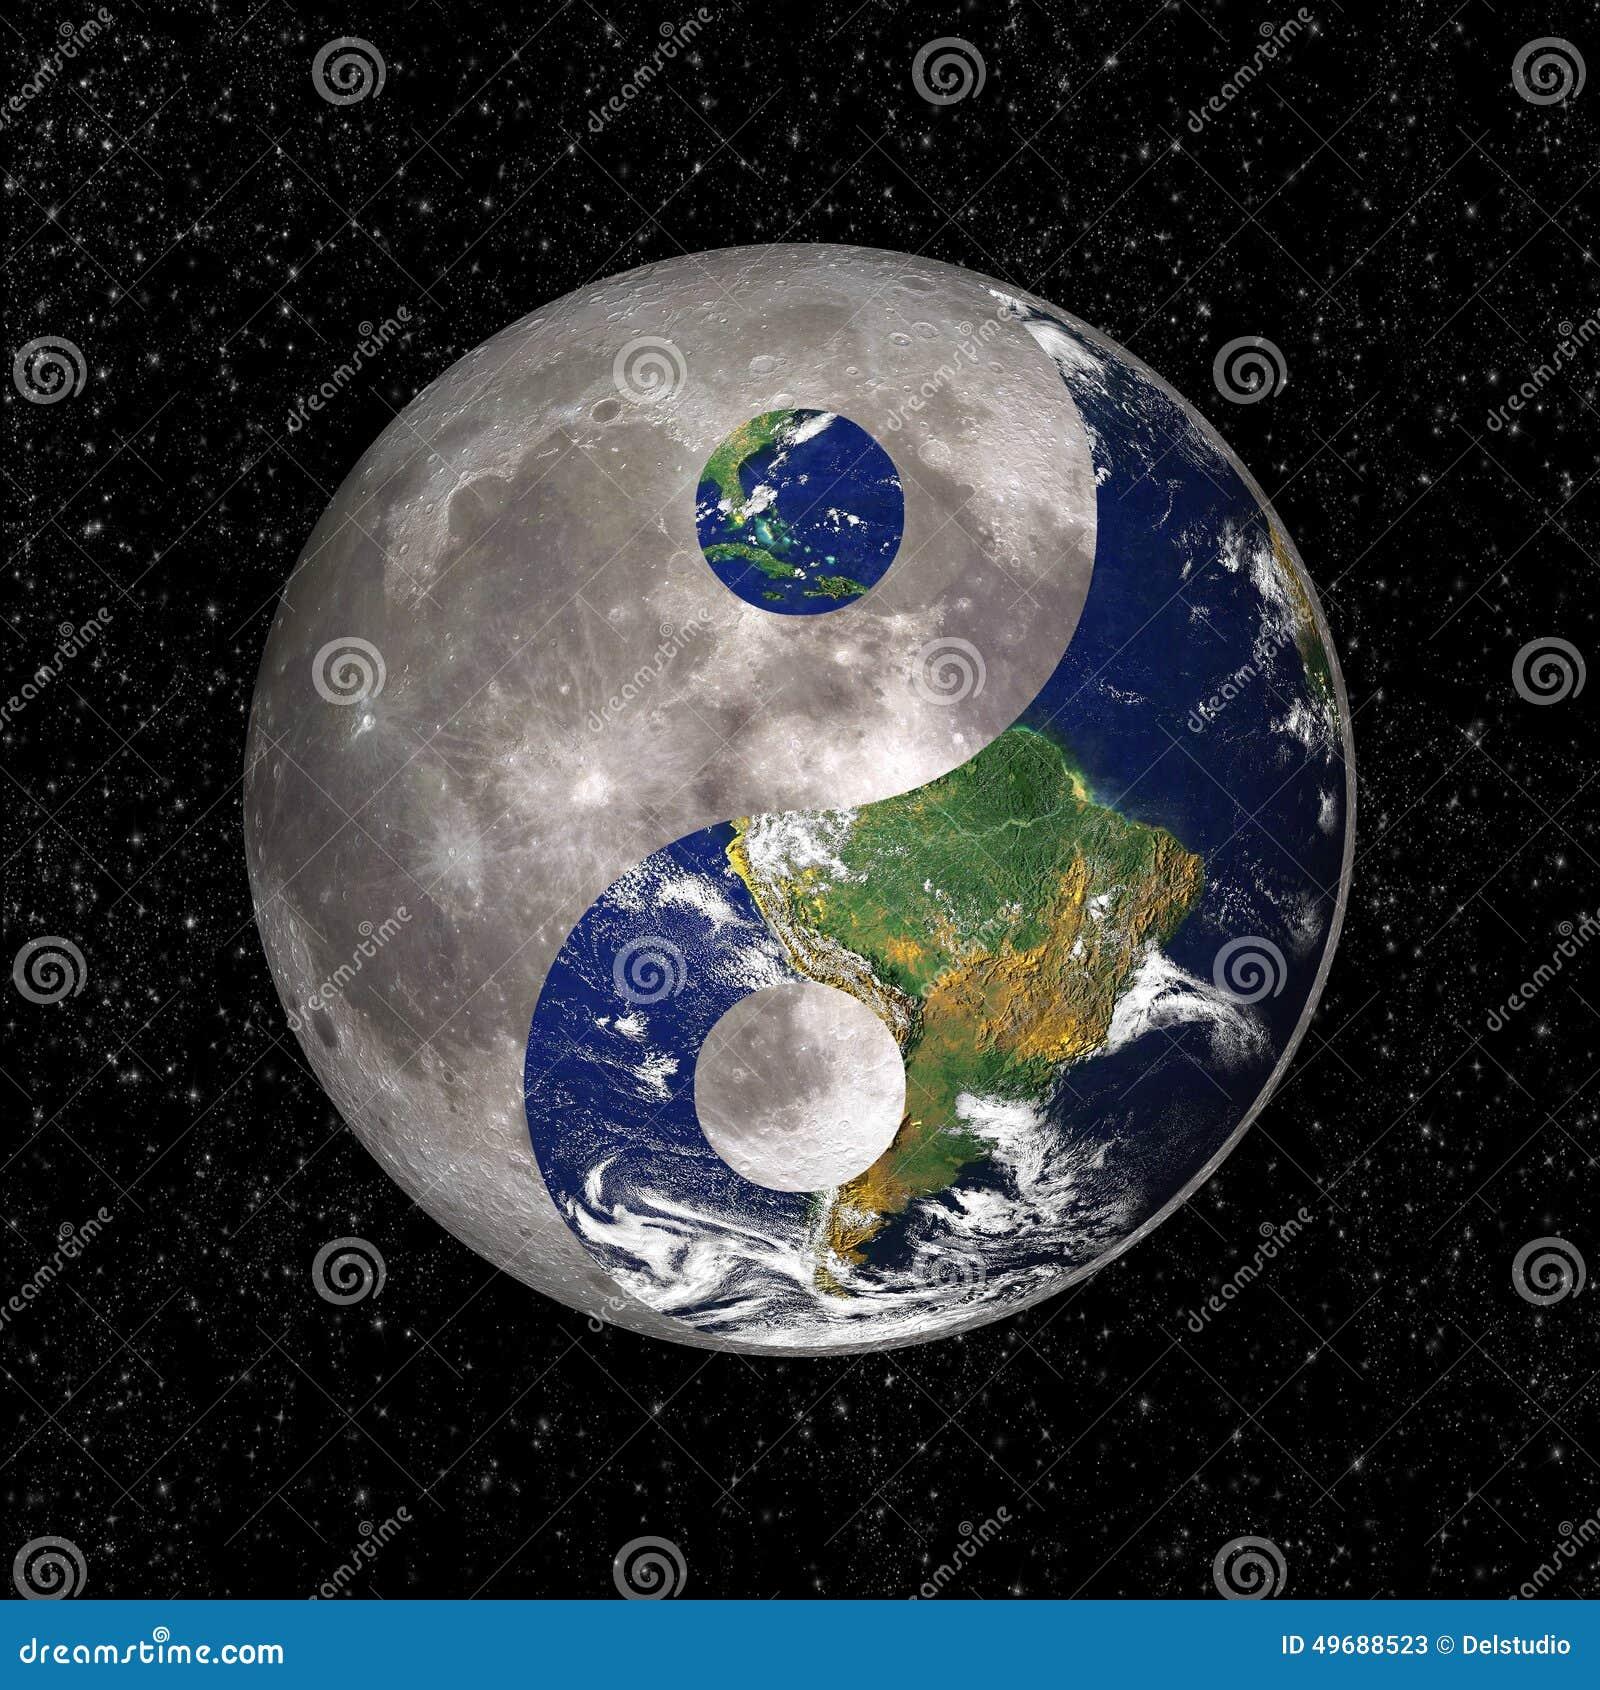 Mr Green Moonlight -kolikkopeli | Mr Green Nettikasino